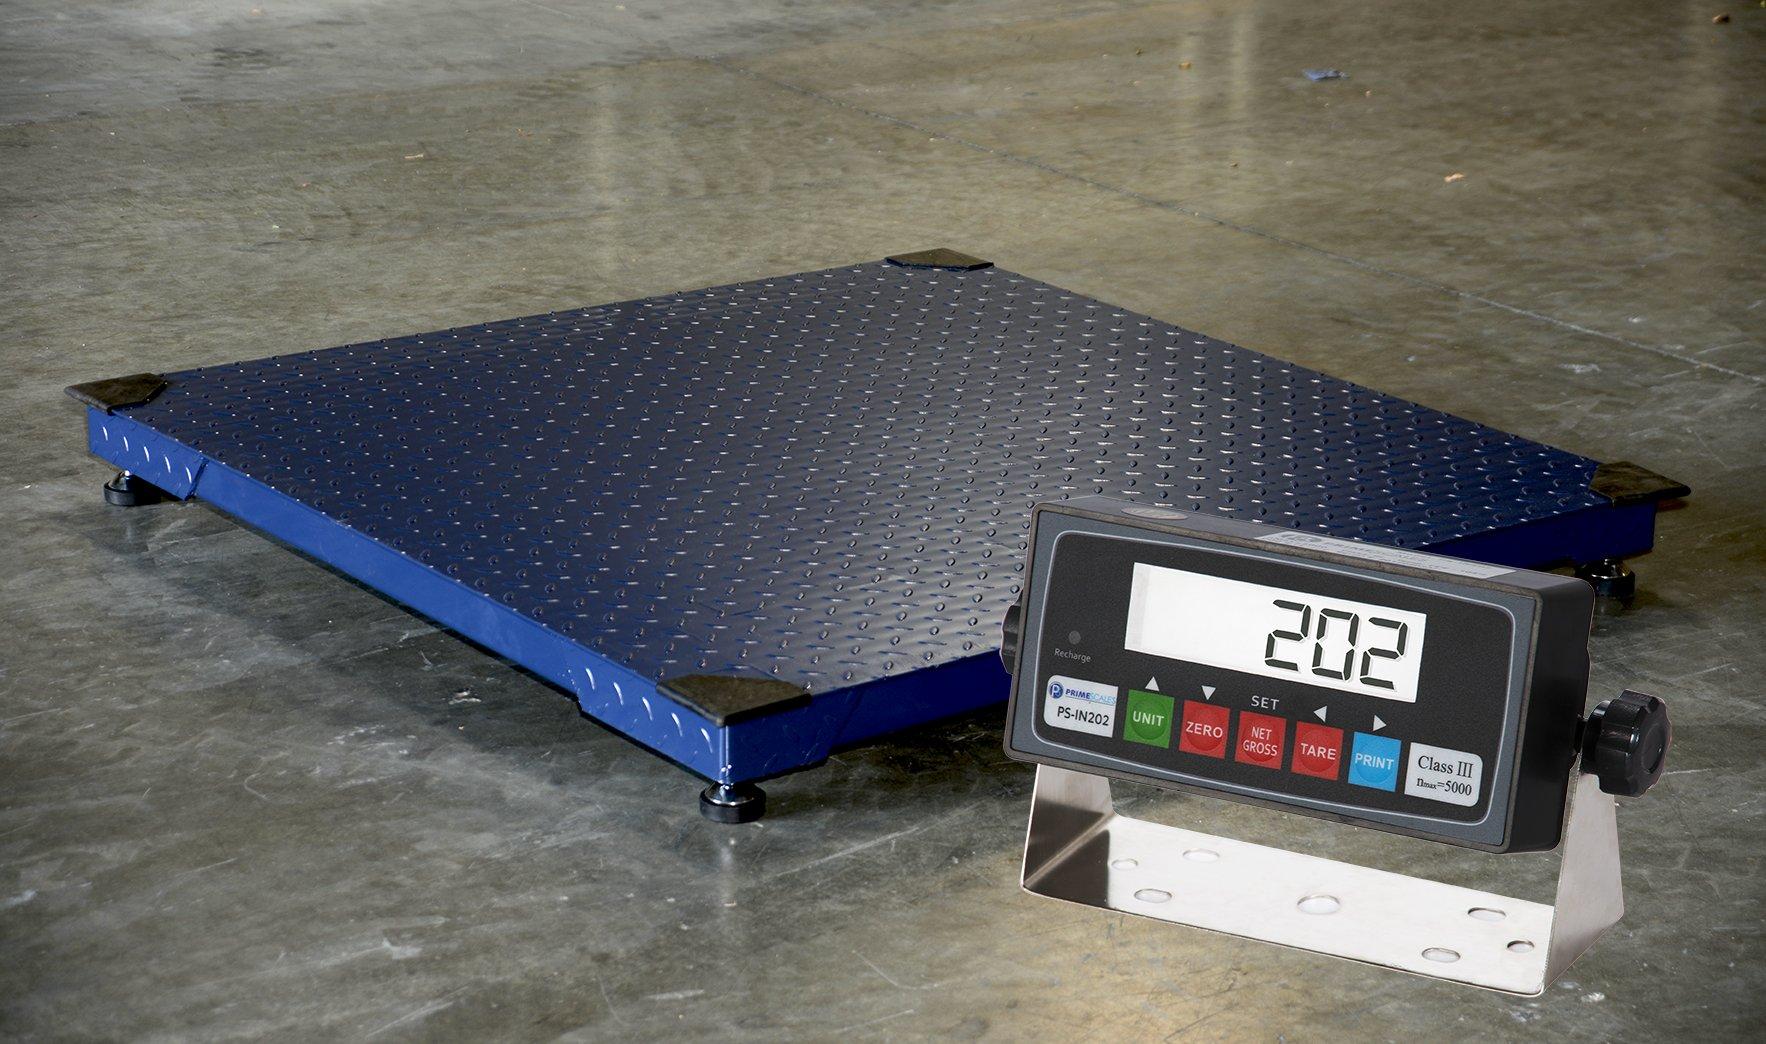 CS2010 2'x2' Floor Scale w/PS-IN202 Indicator